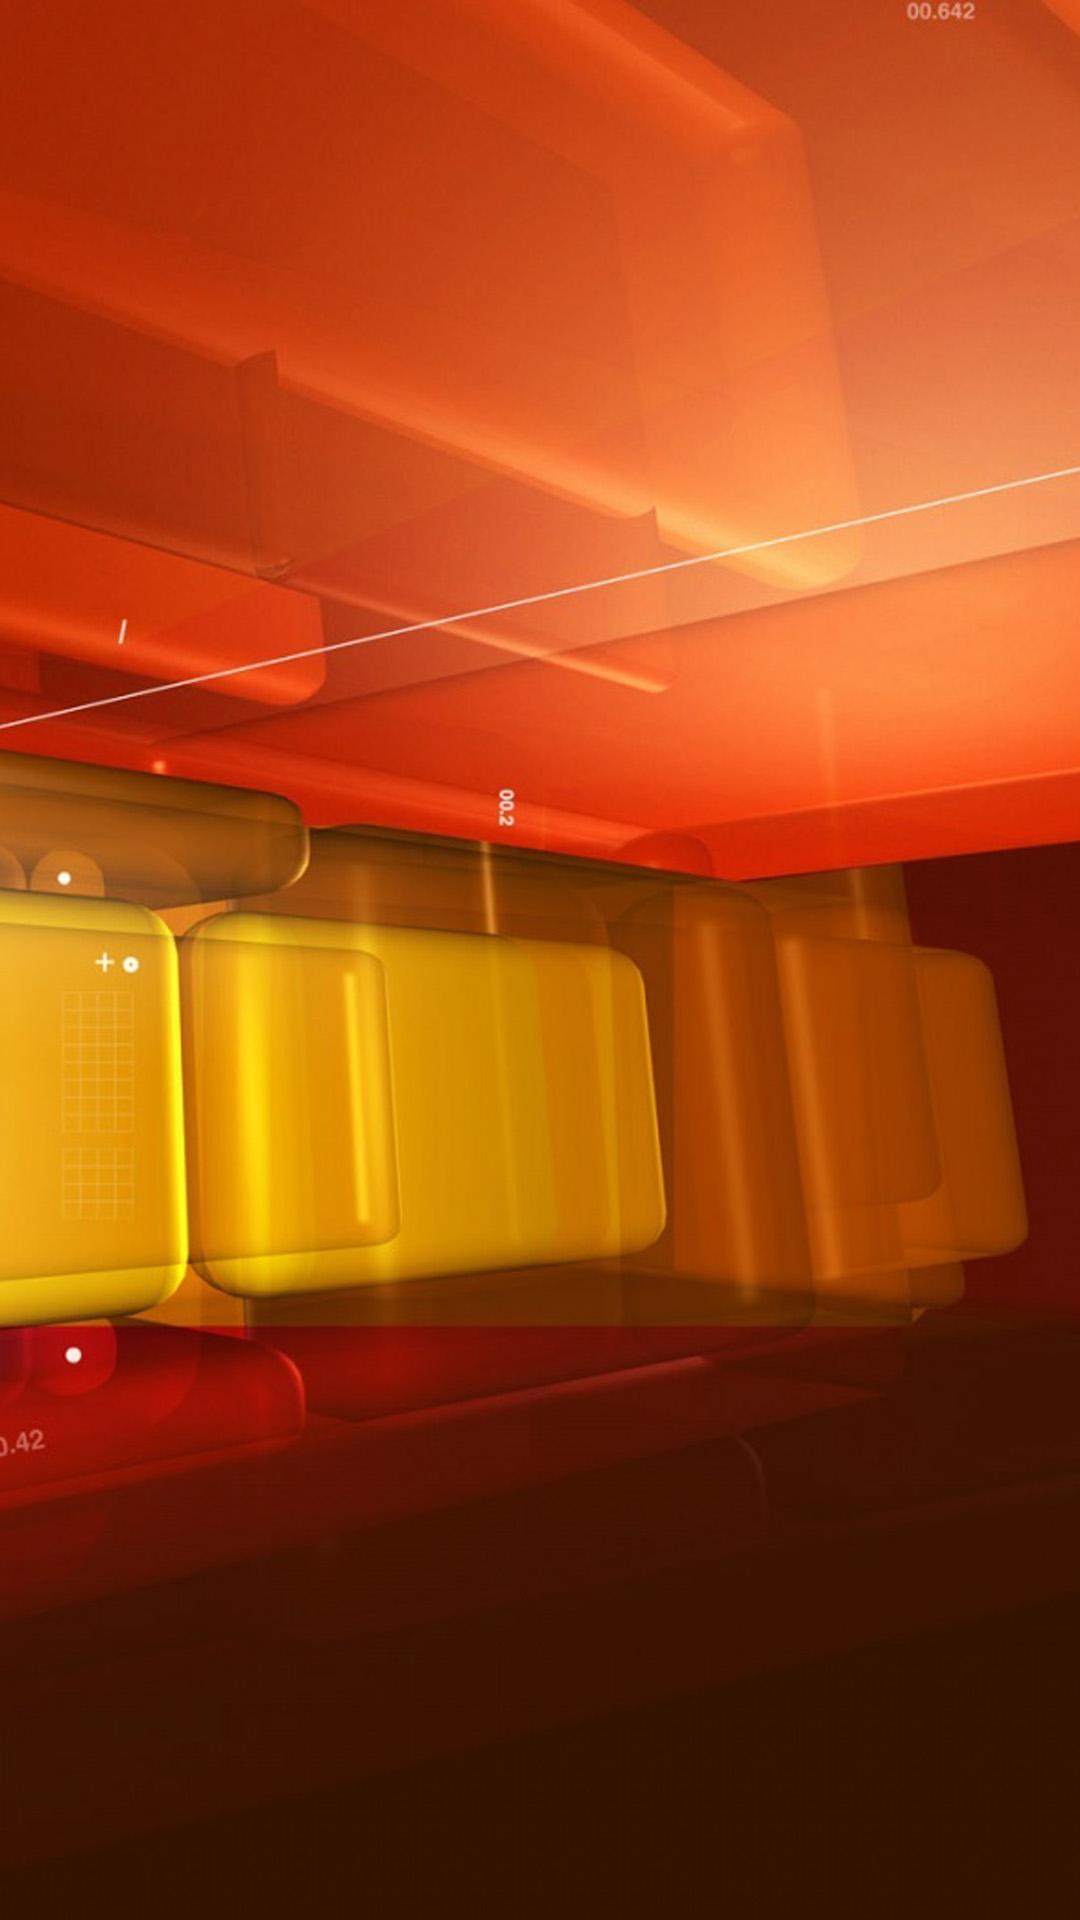 Orange tech design 2 Galaxy S5 Wallpaper